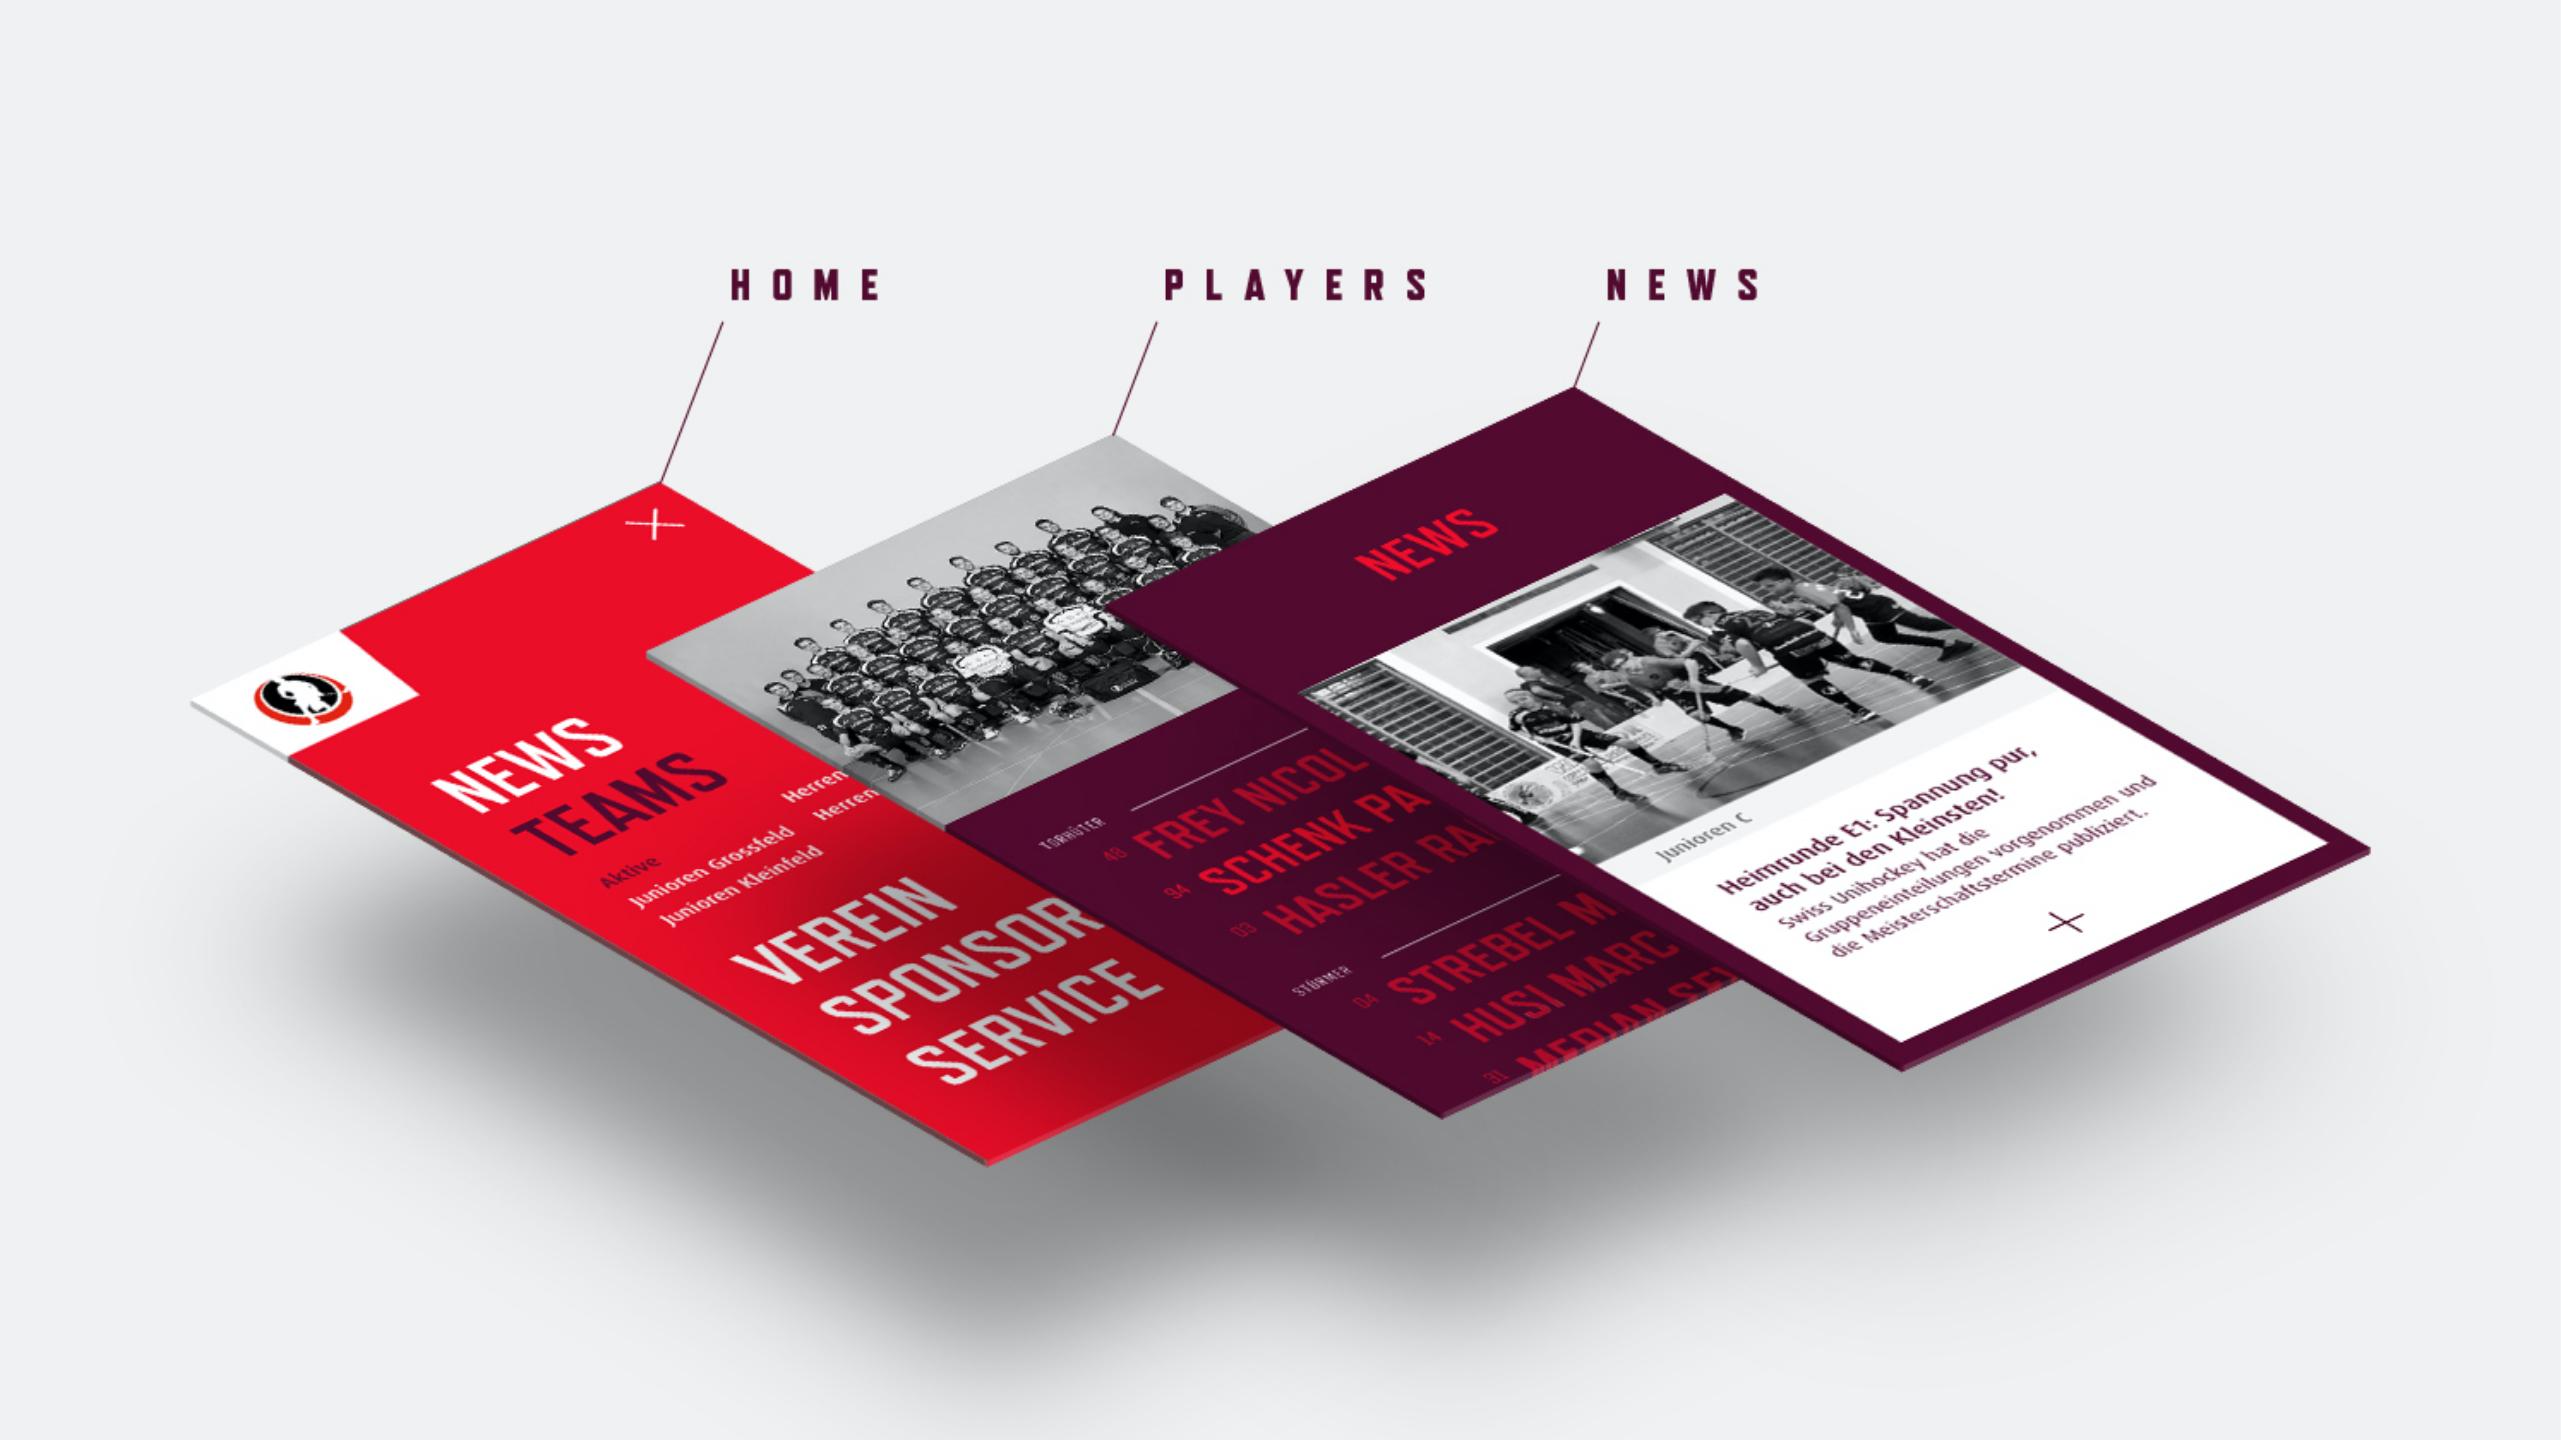 Screendesigns